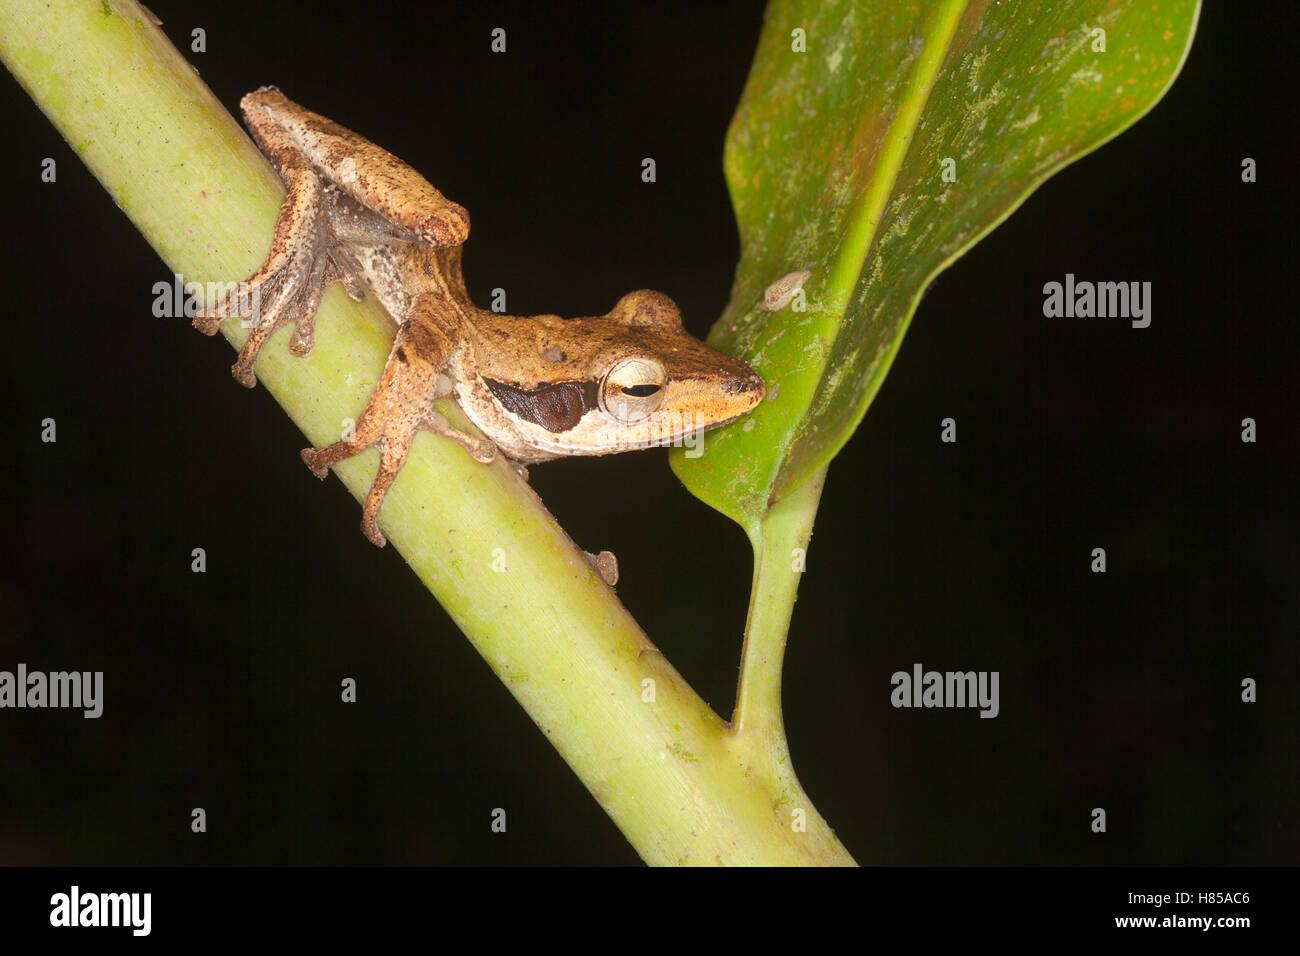 Dark-eared Tree Frog (Polypedates macrotis) in rainforest at night - Stock Image